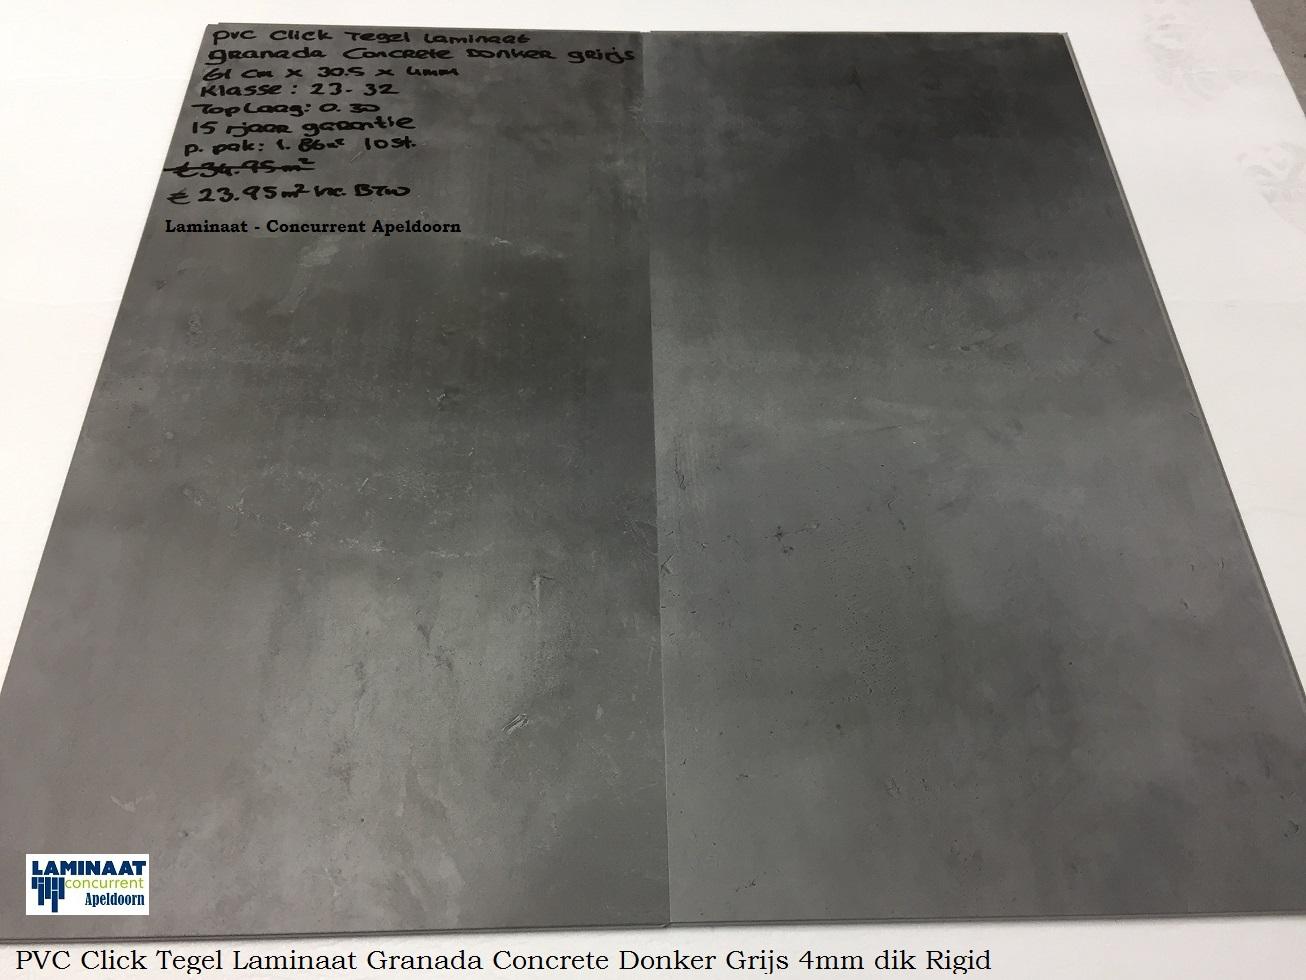 Pvc click tegel laminaat concrete donker grijs granada laminaat